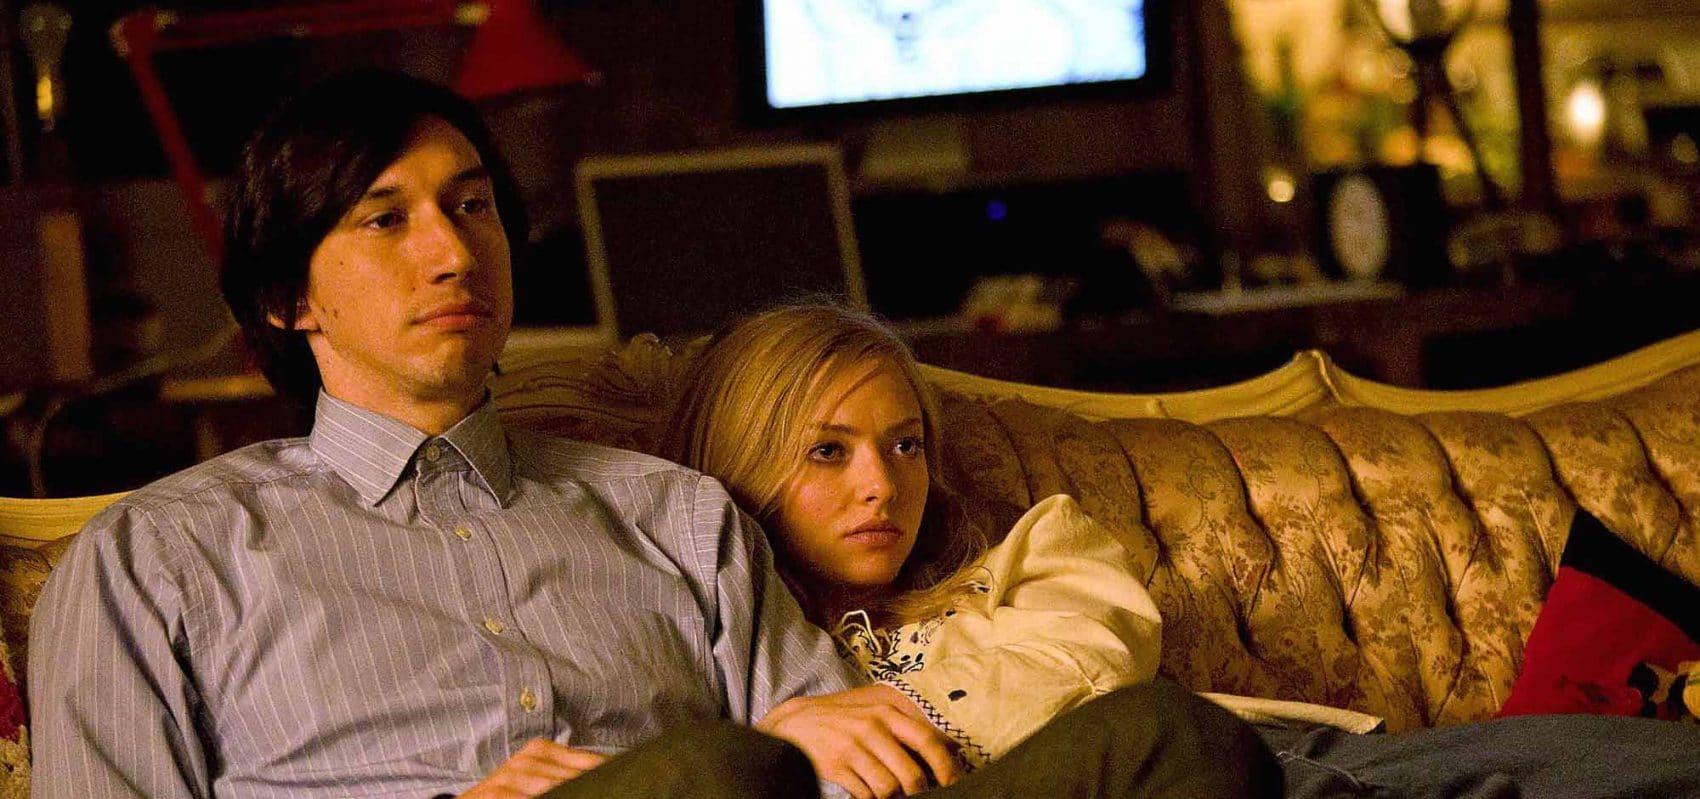 While We're young – critique du film